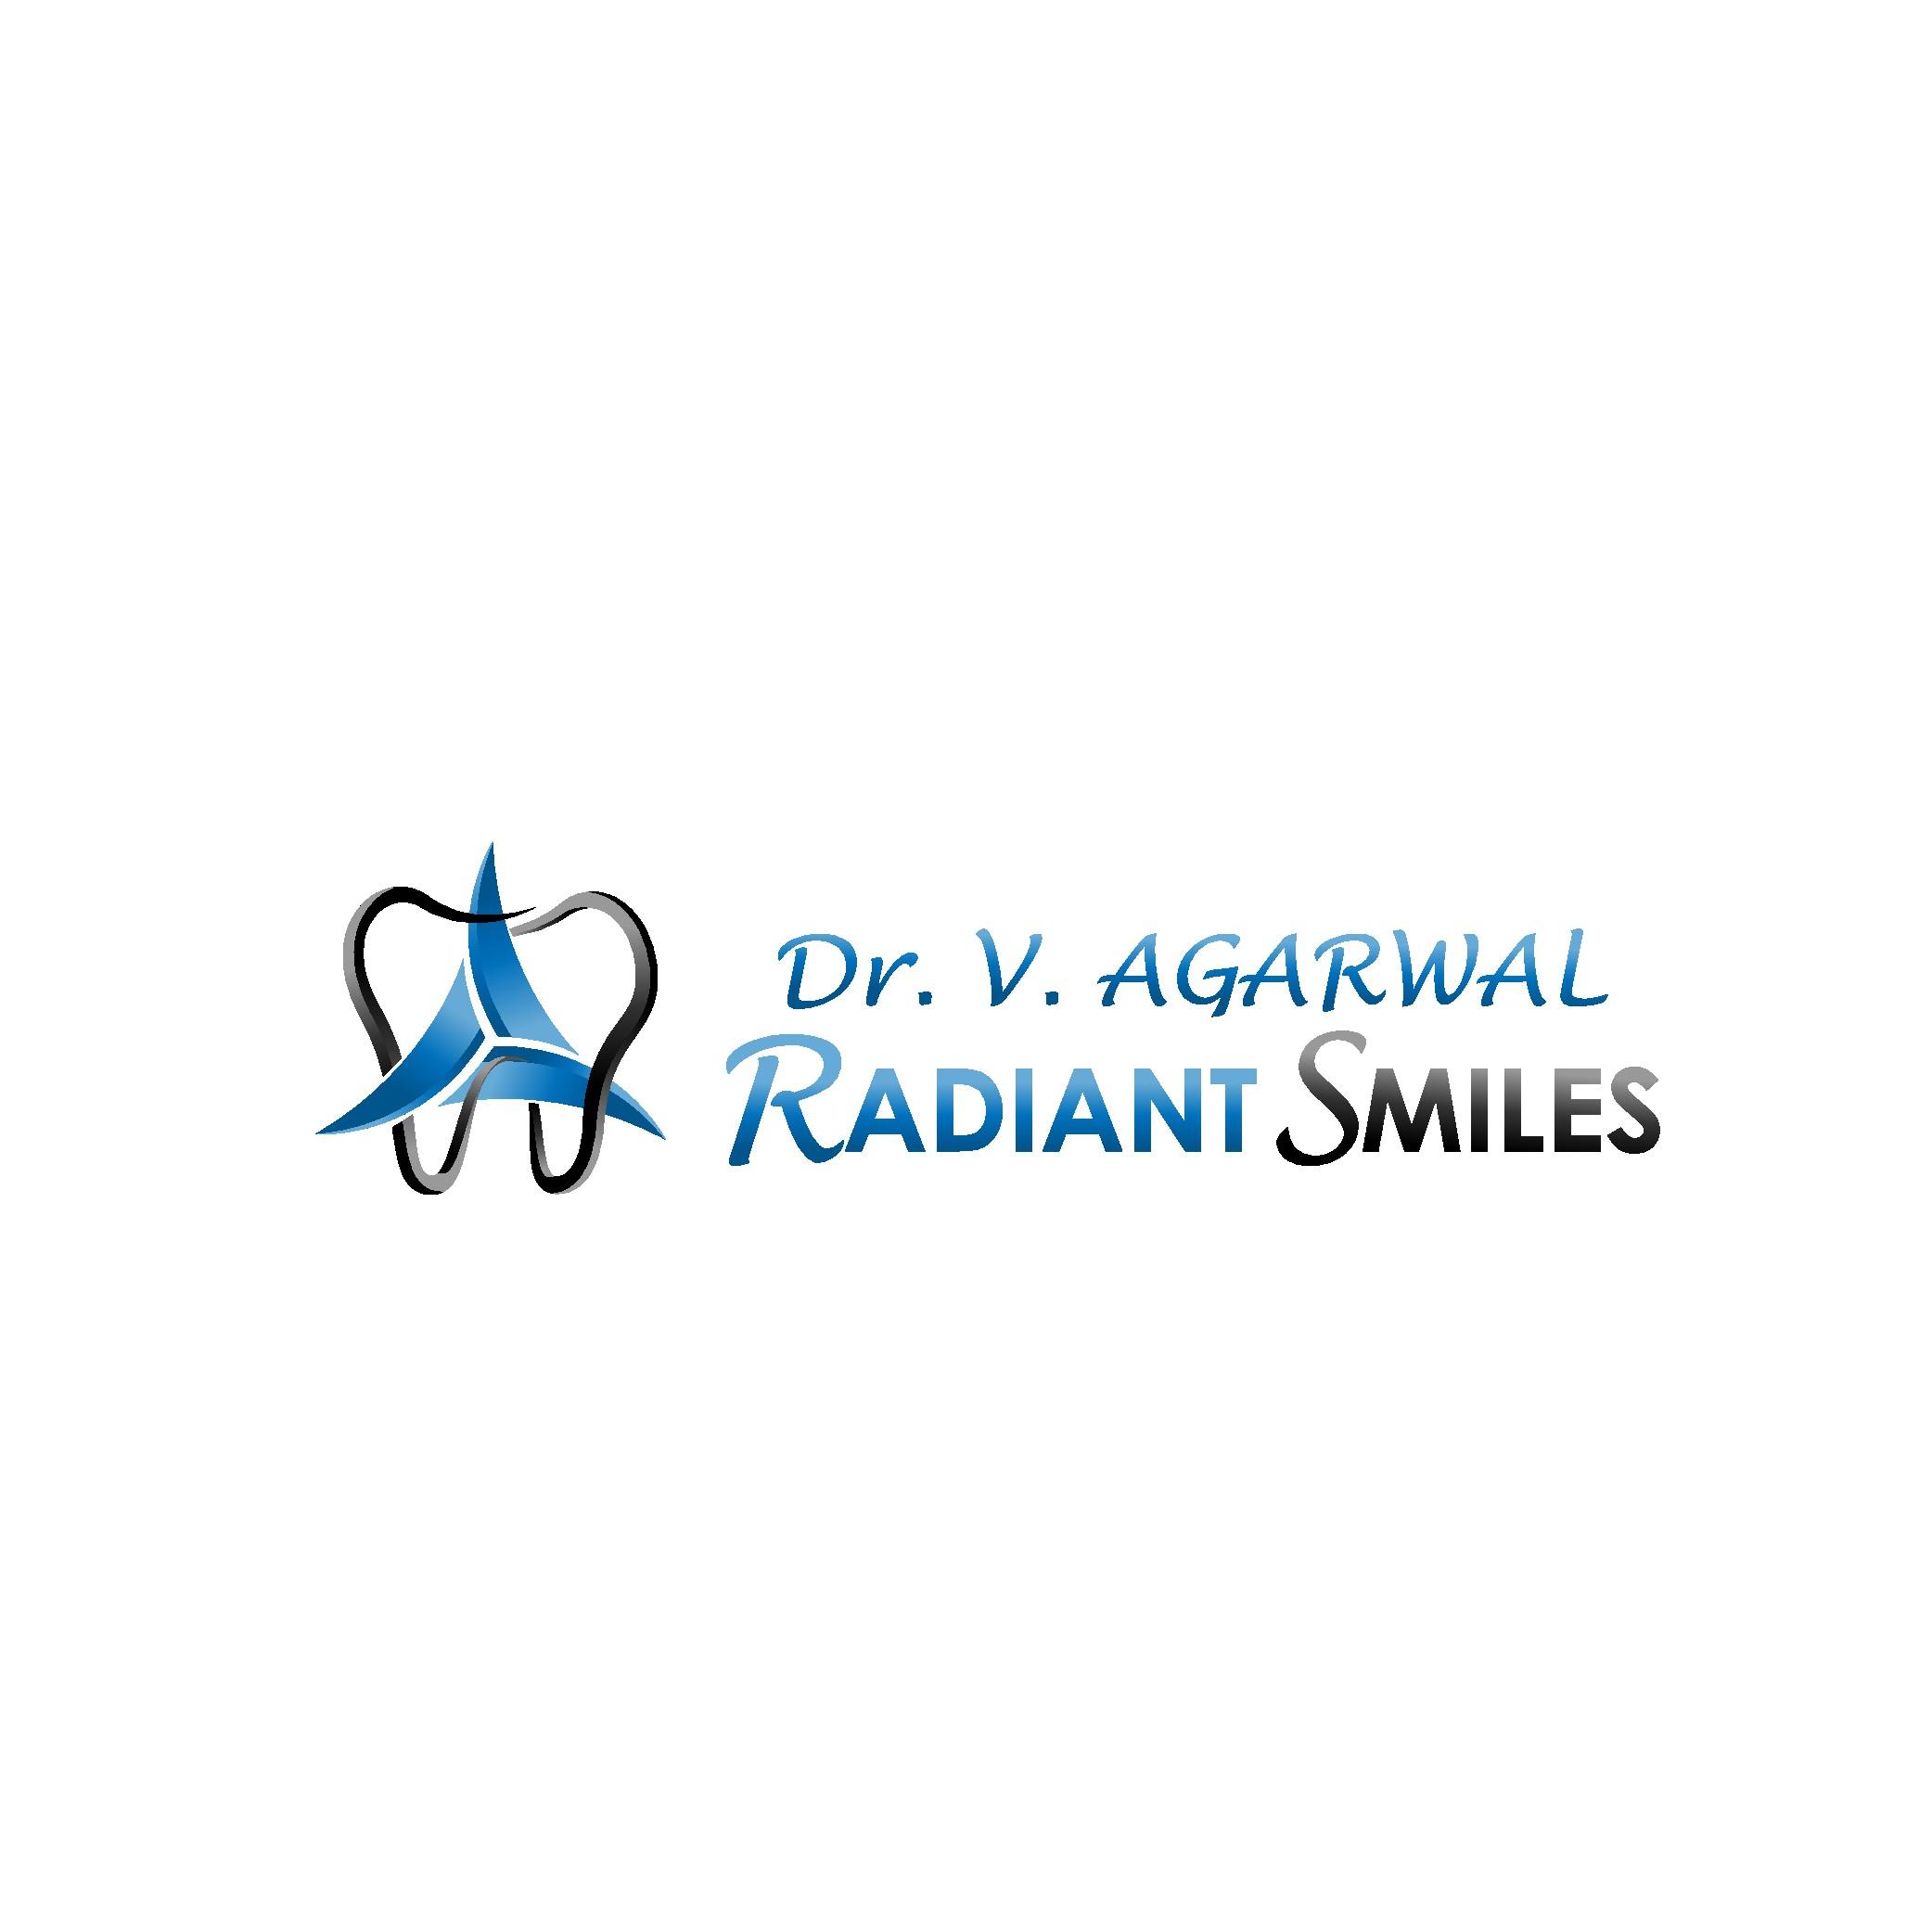 Create a logo for a New Dental Office